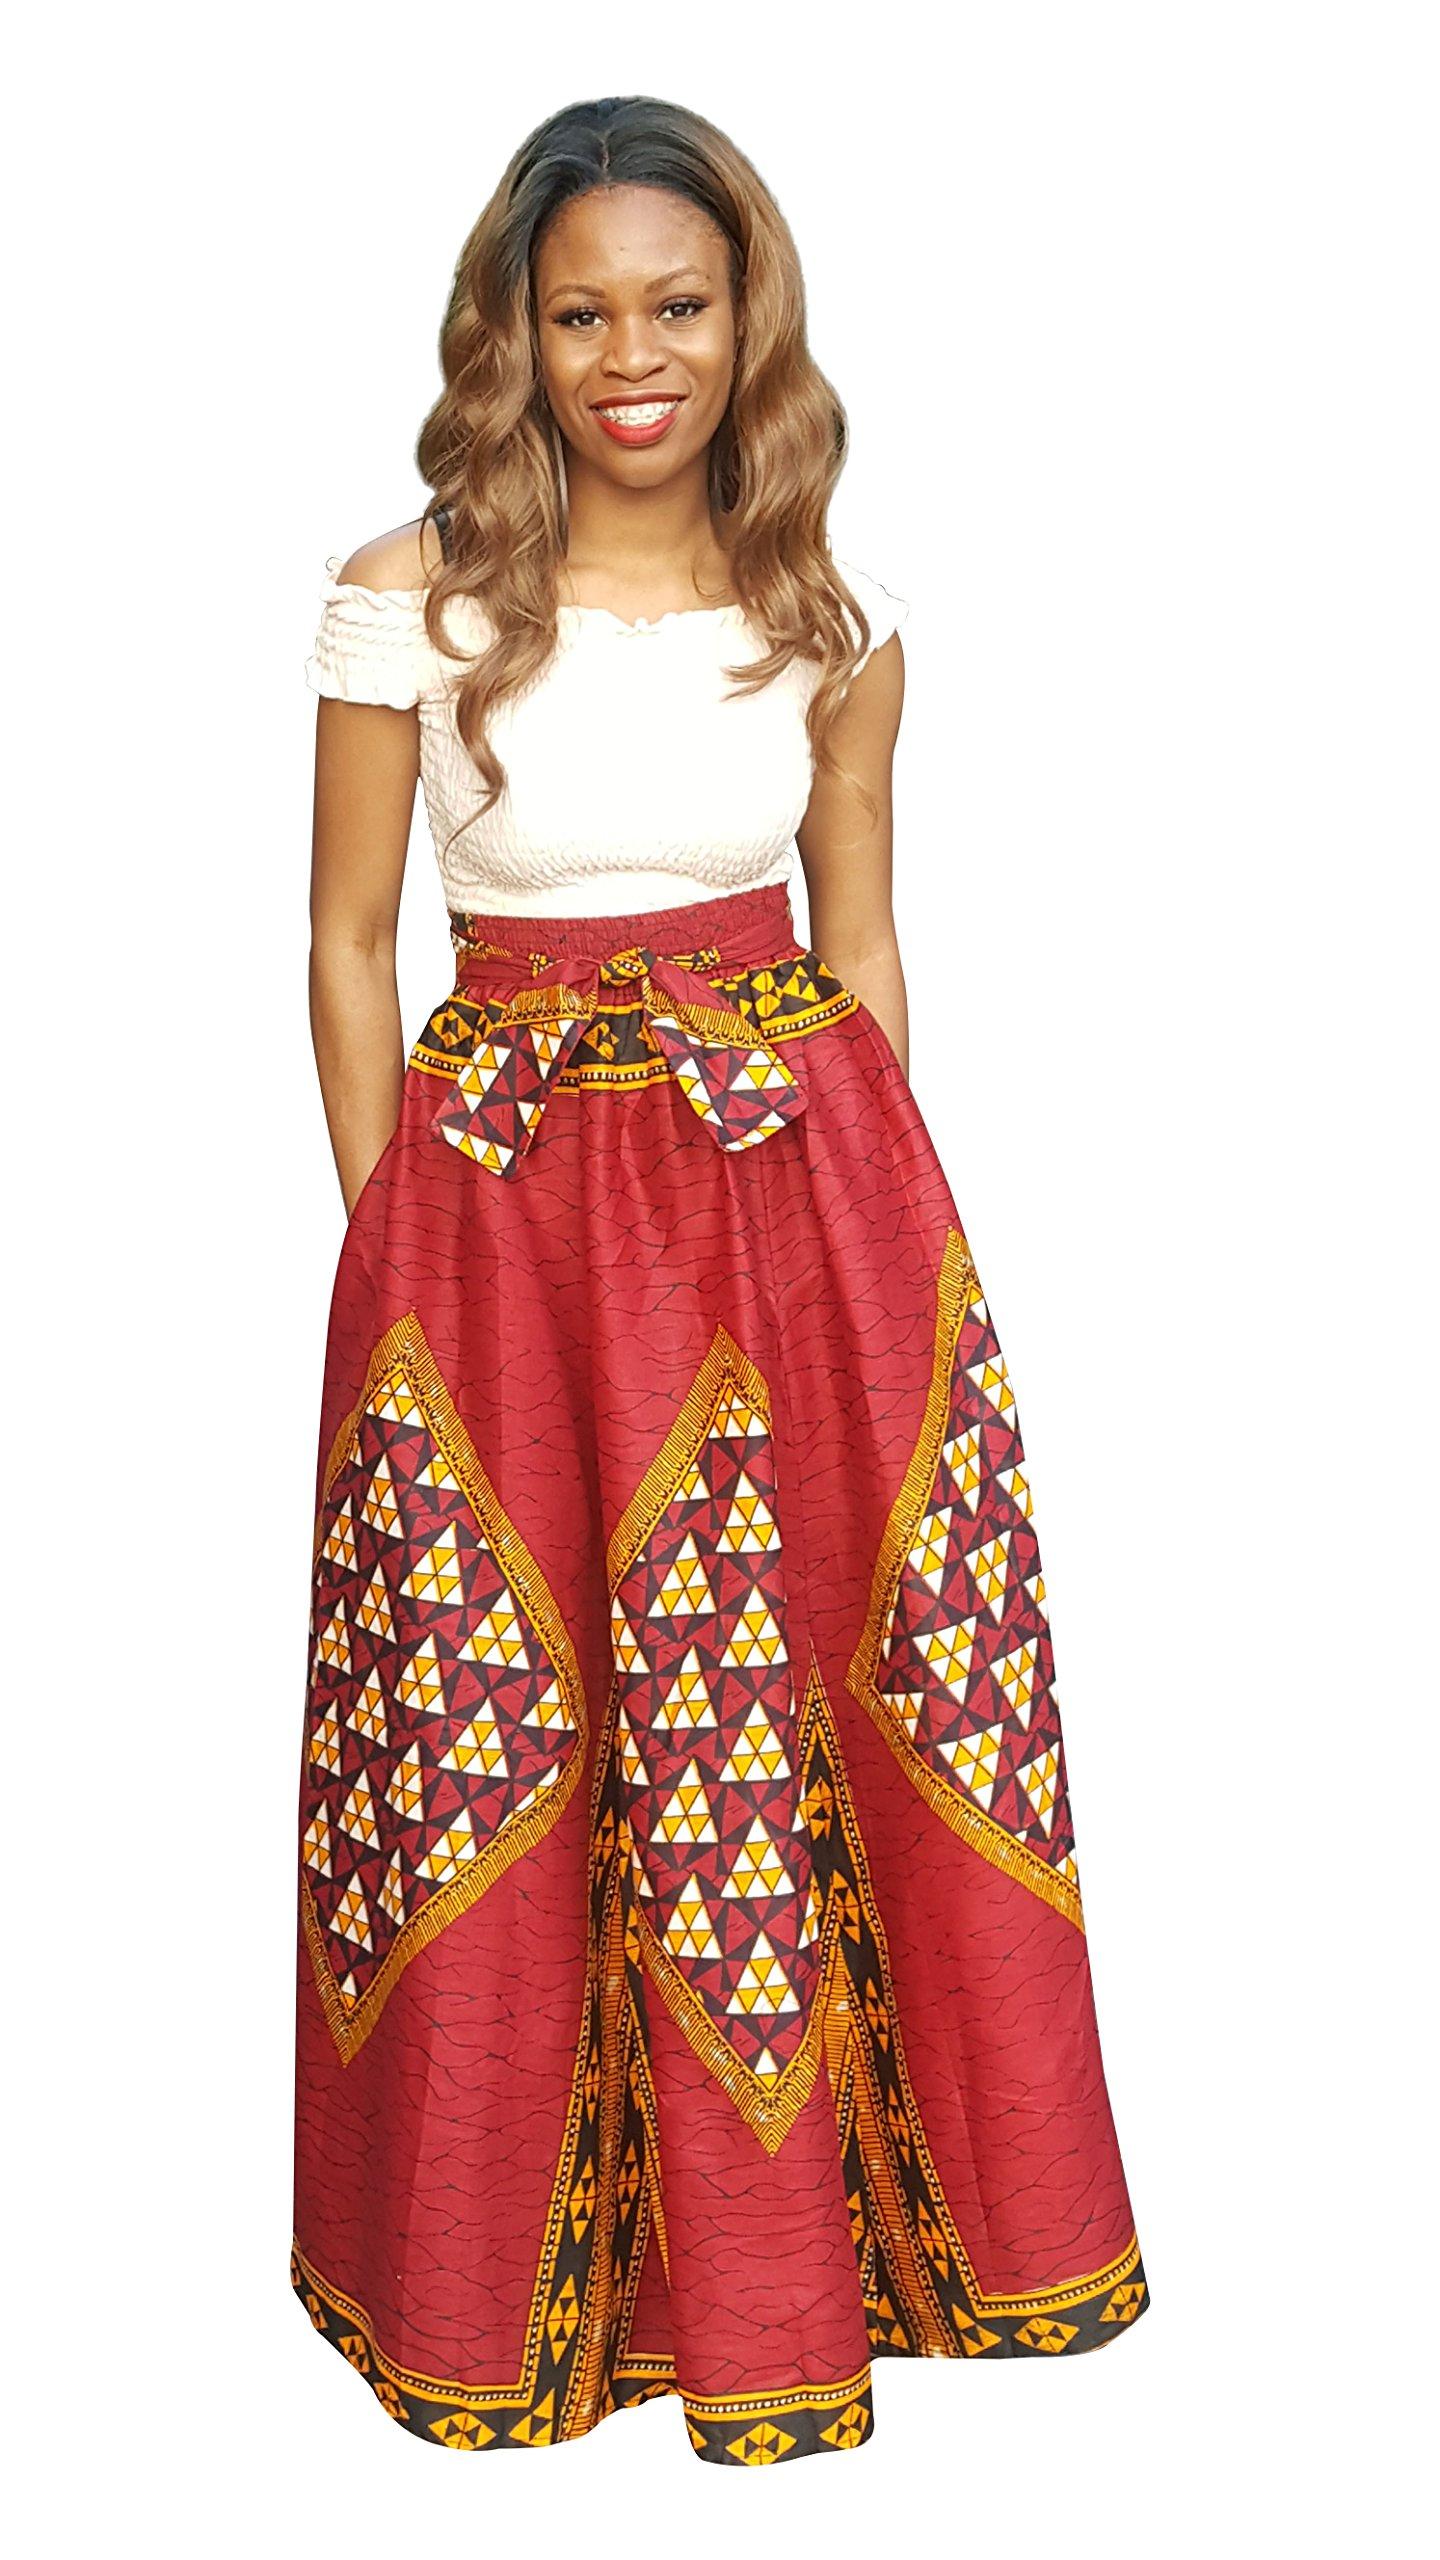 Dupsie s Red African Print Diamond High Waist Maxi Skirt 77a9b48b6f37